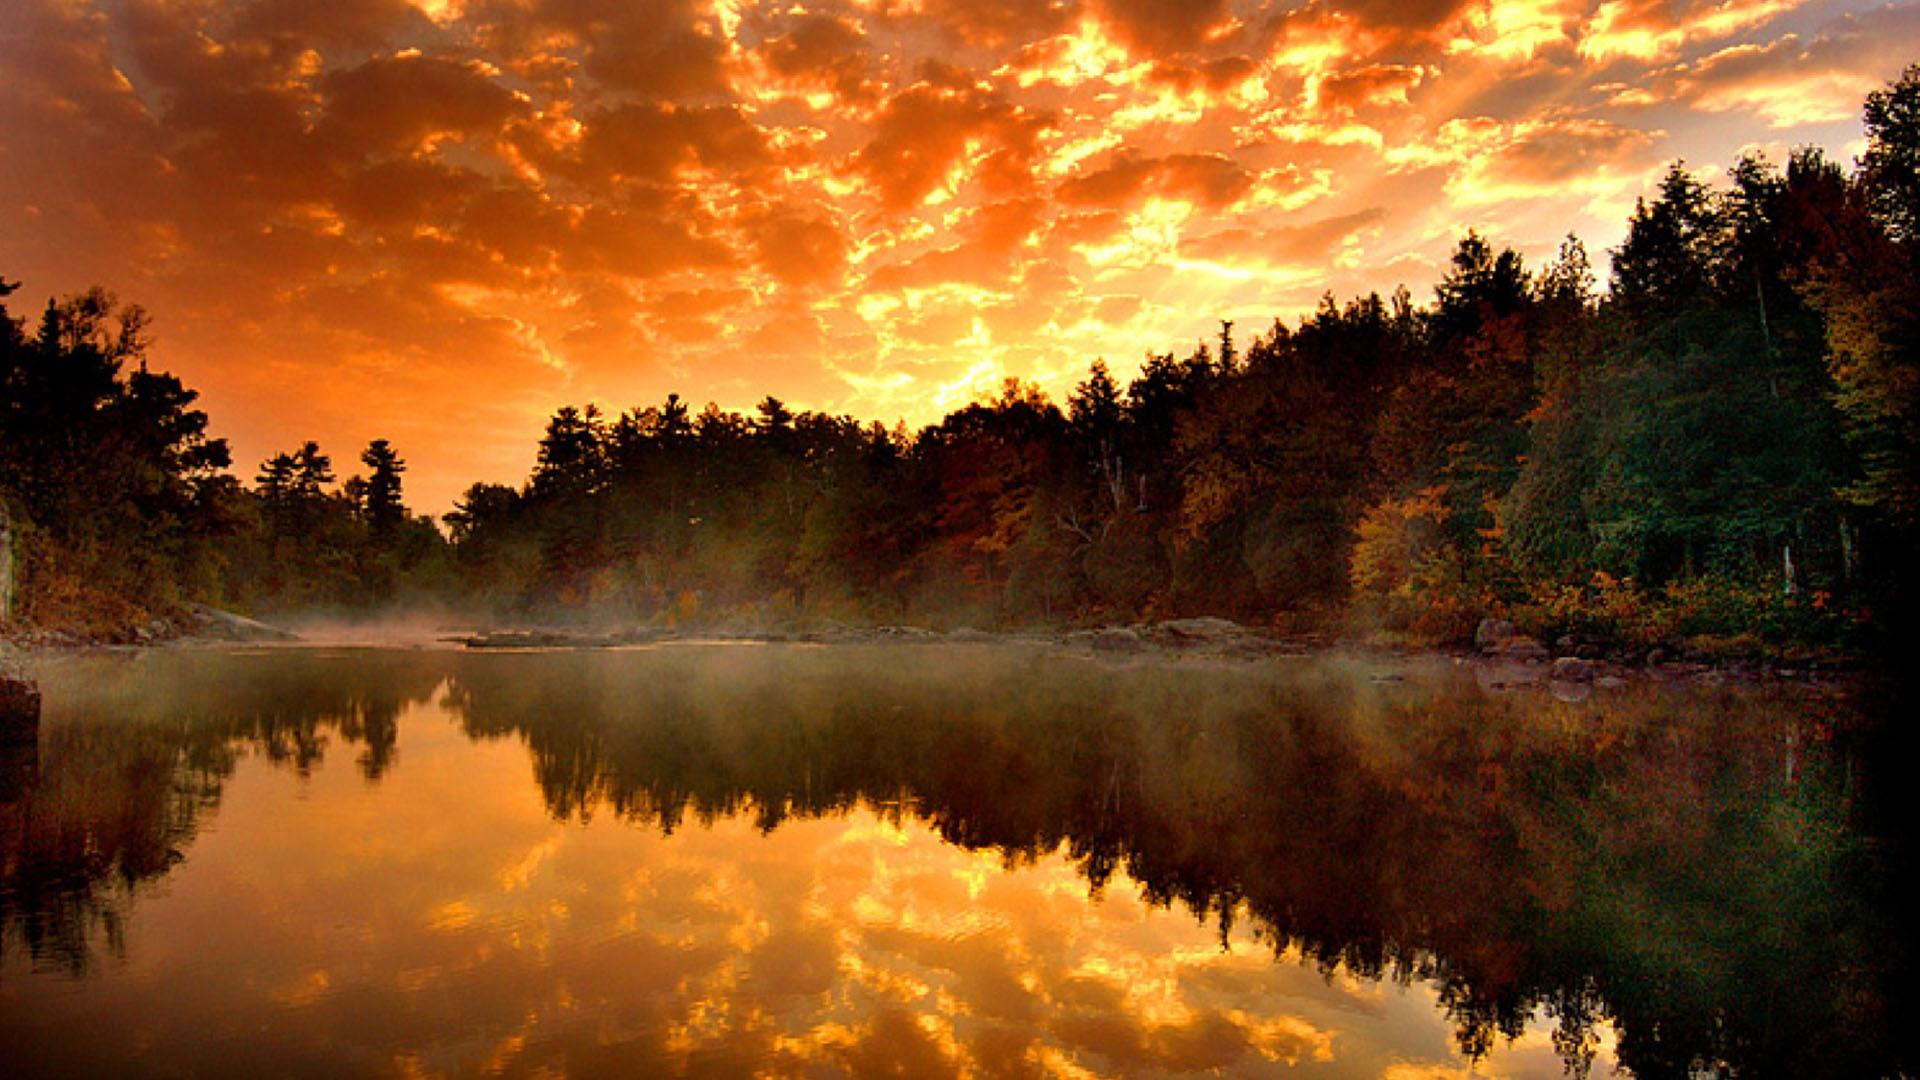 Free Download Nature Sunset Wallpaper Hd 1080p Hd Wallpaper